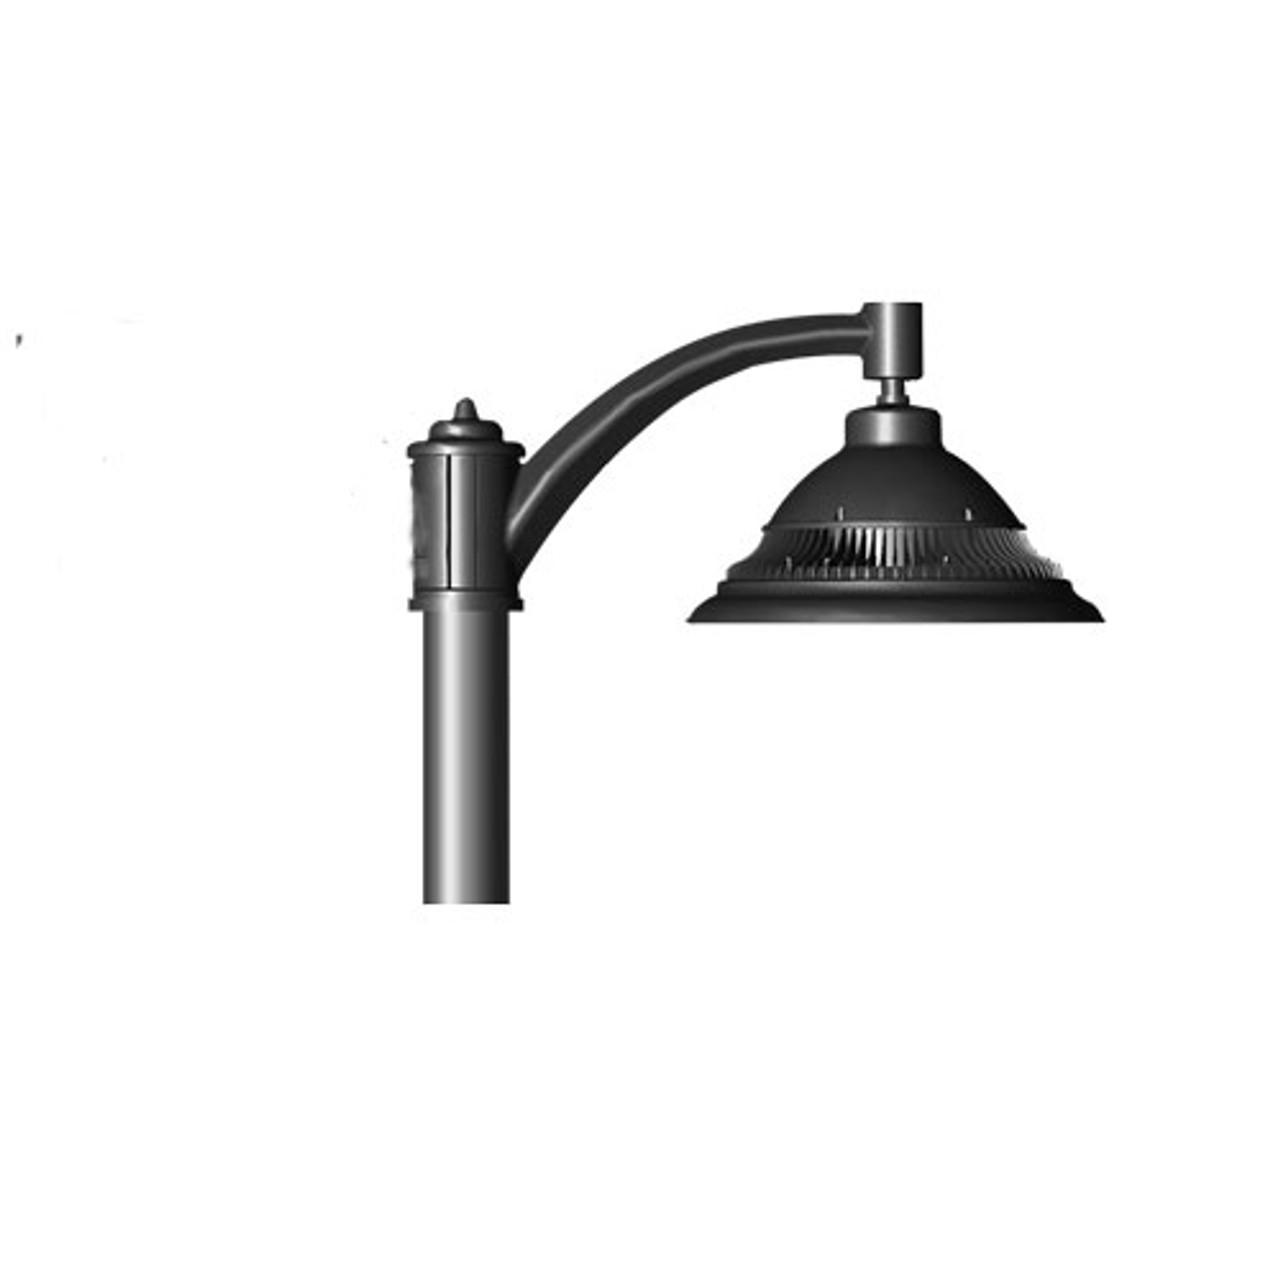 Single Pendant 84 Watt LED Decorative Pole Mounted